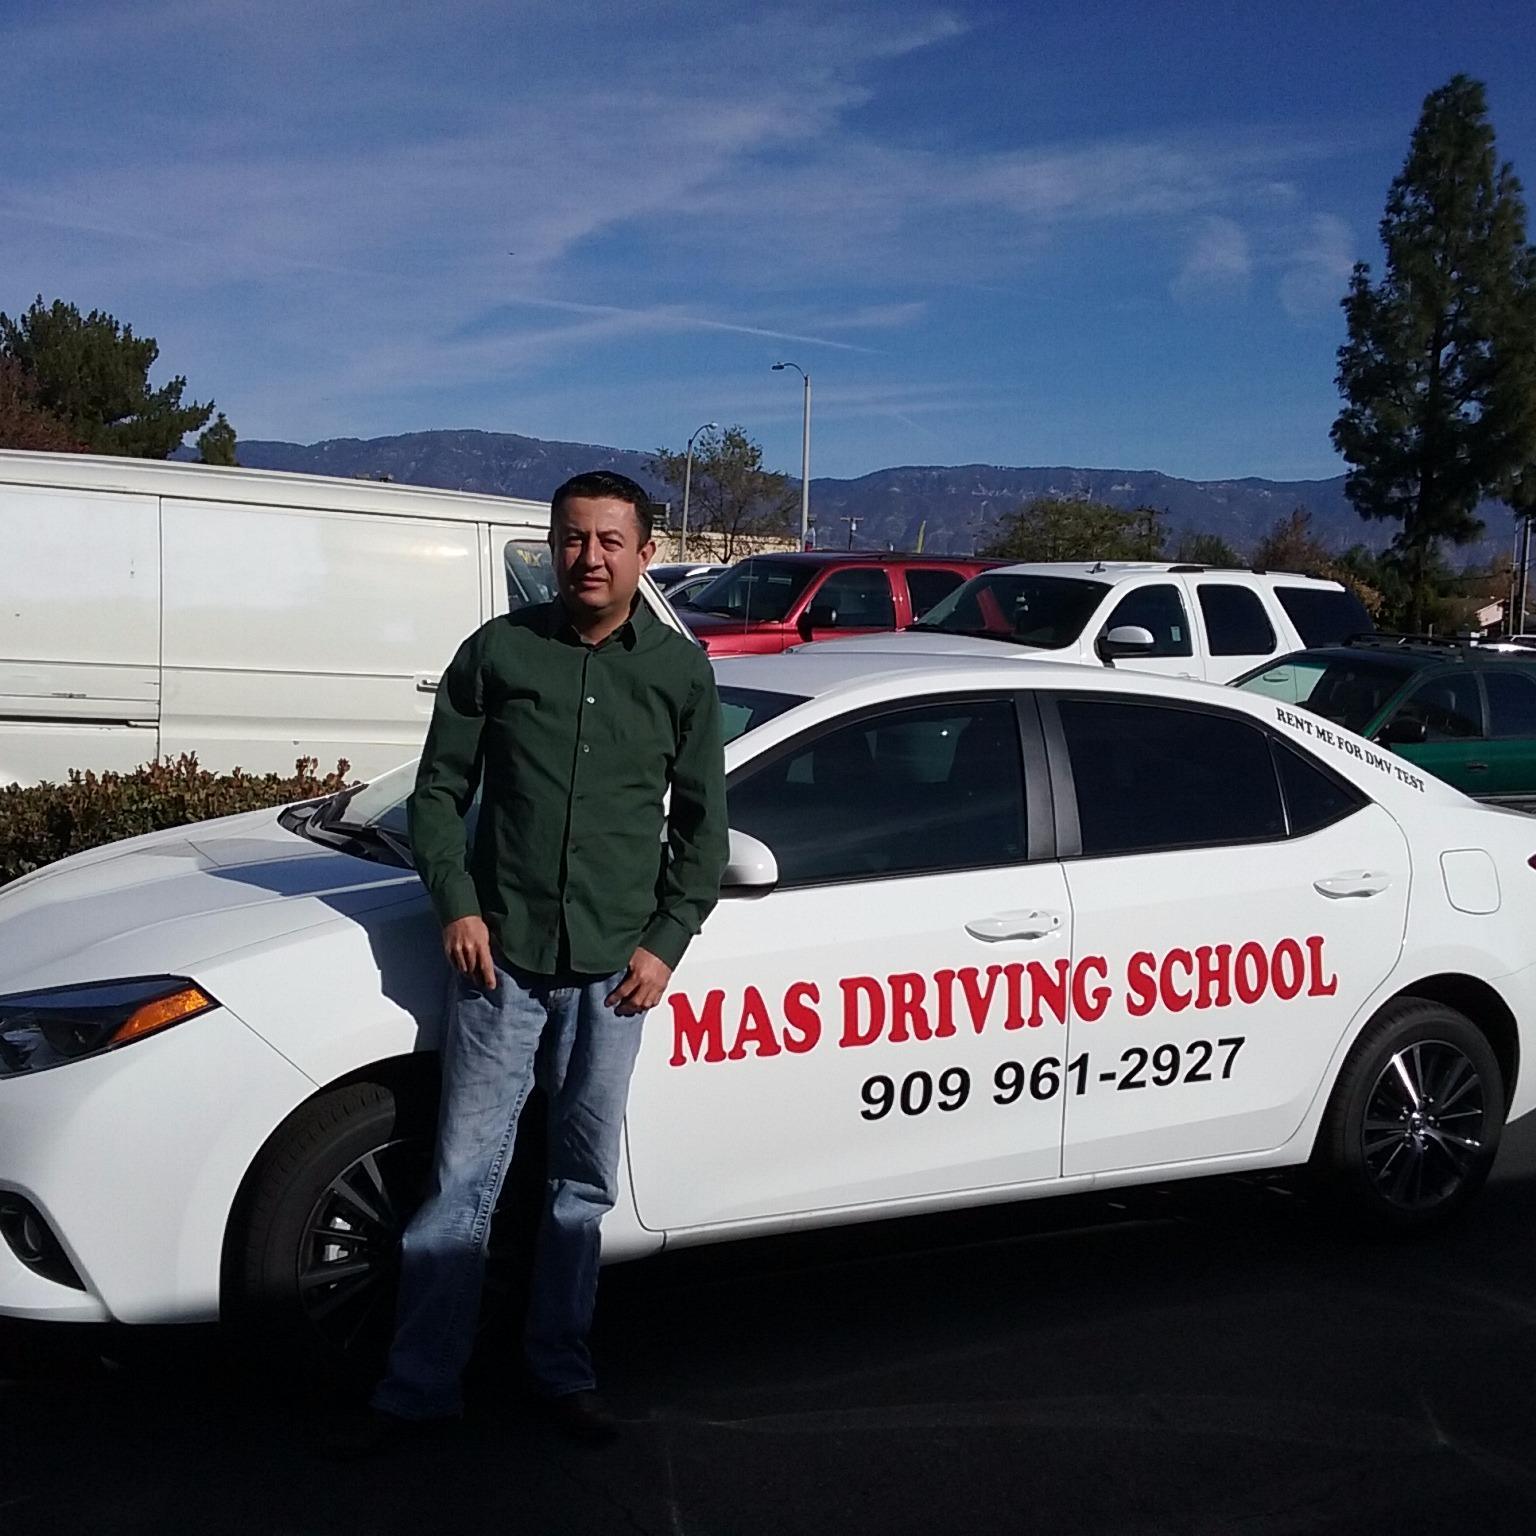 Mas Driving School